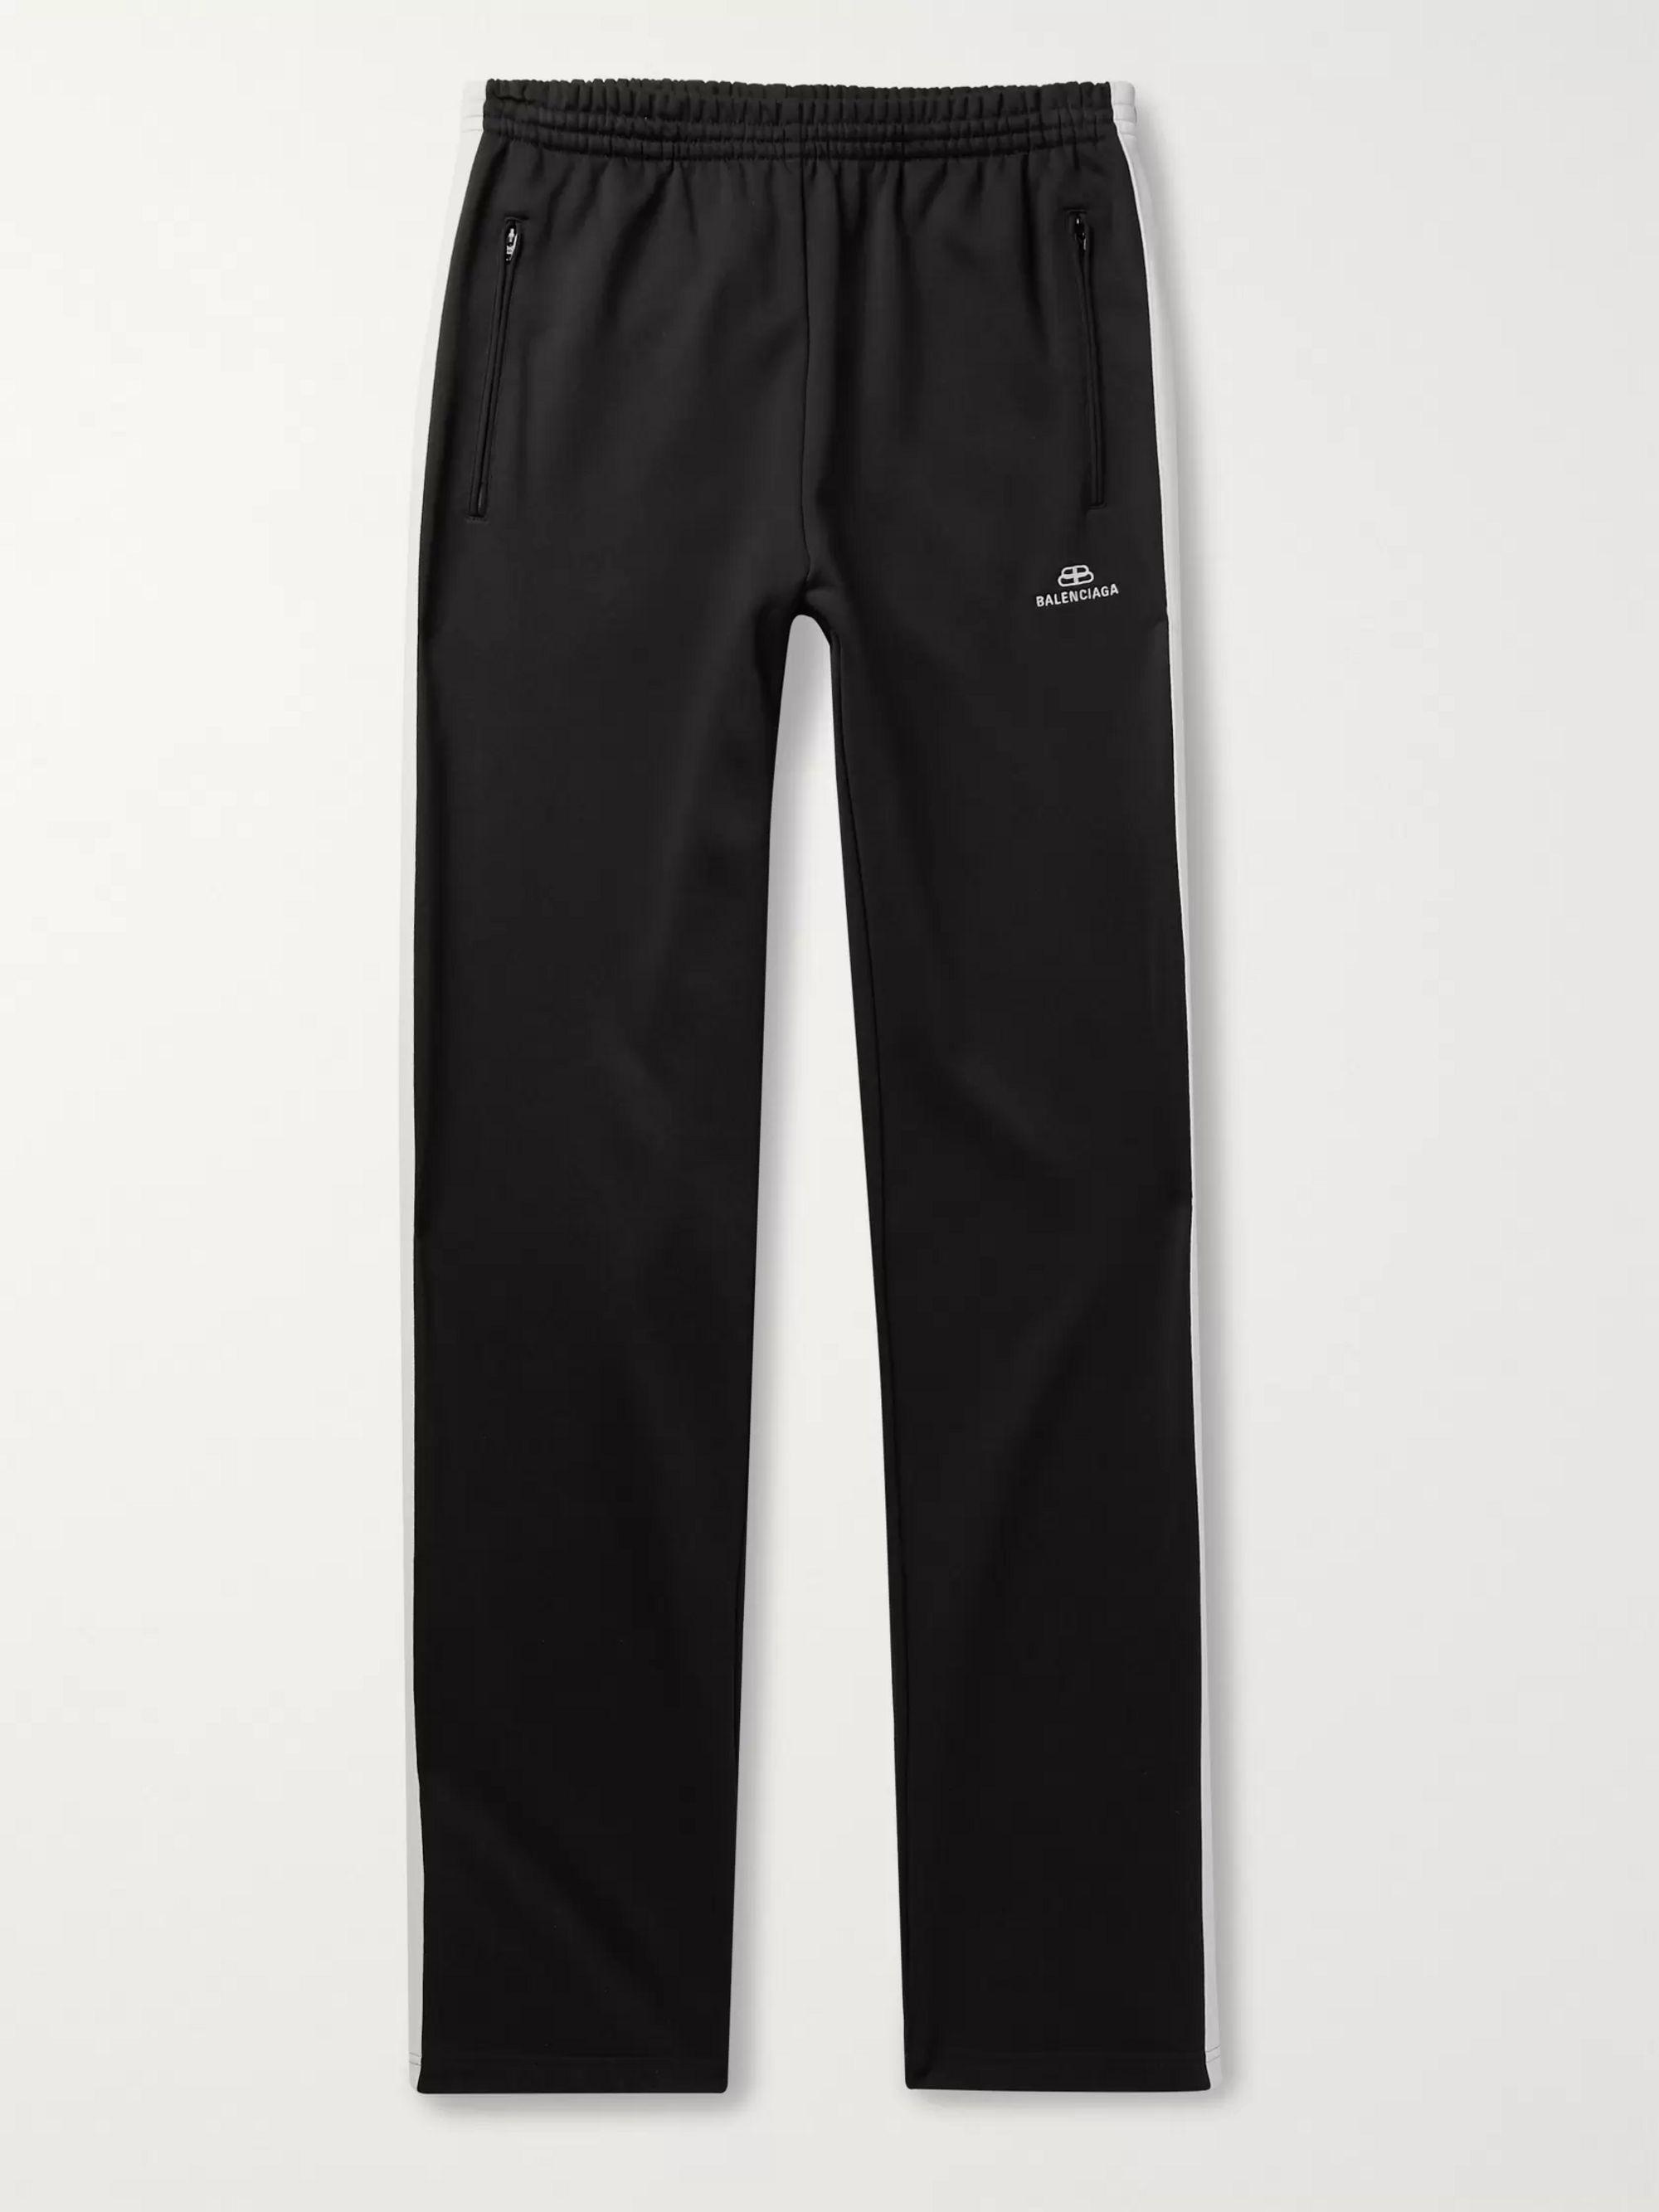 lado Evento condensador  Black Logo-Embroidered Striped Loopback Jersey Track Pants | Balenciaga |  MR PORTER